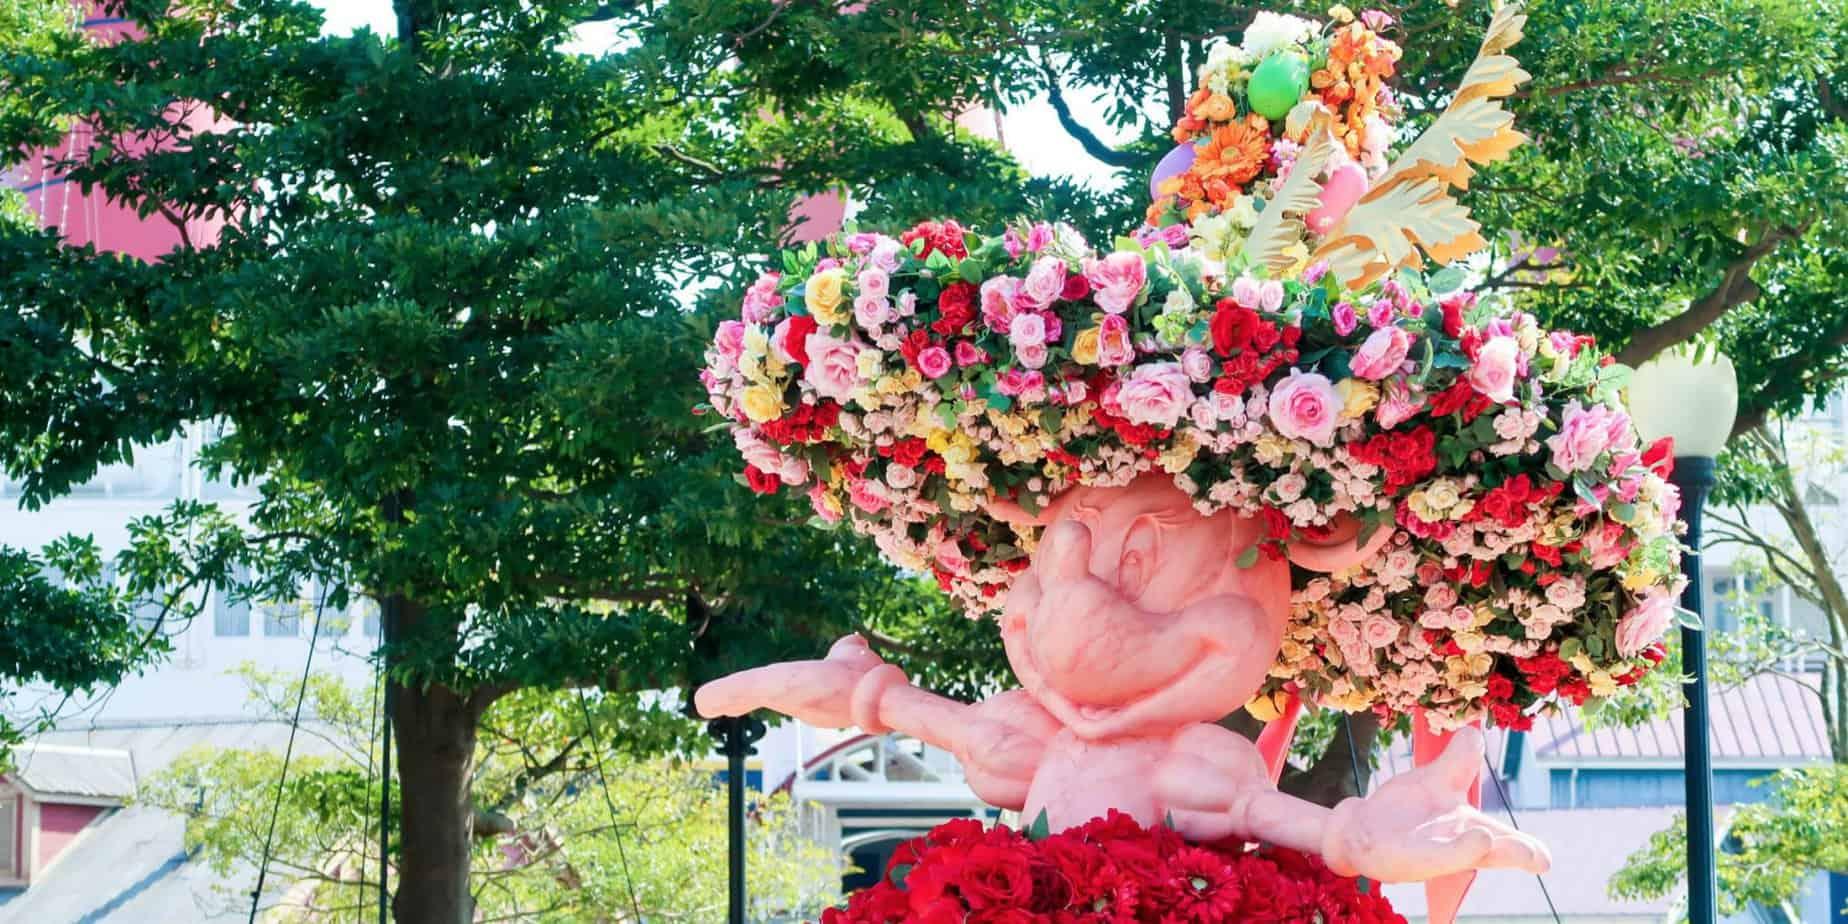 Guide to Disney's Easter at Tokyo Disney Resort